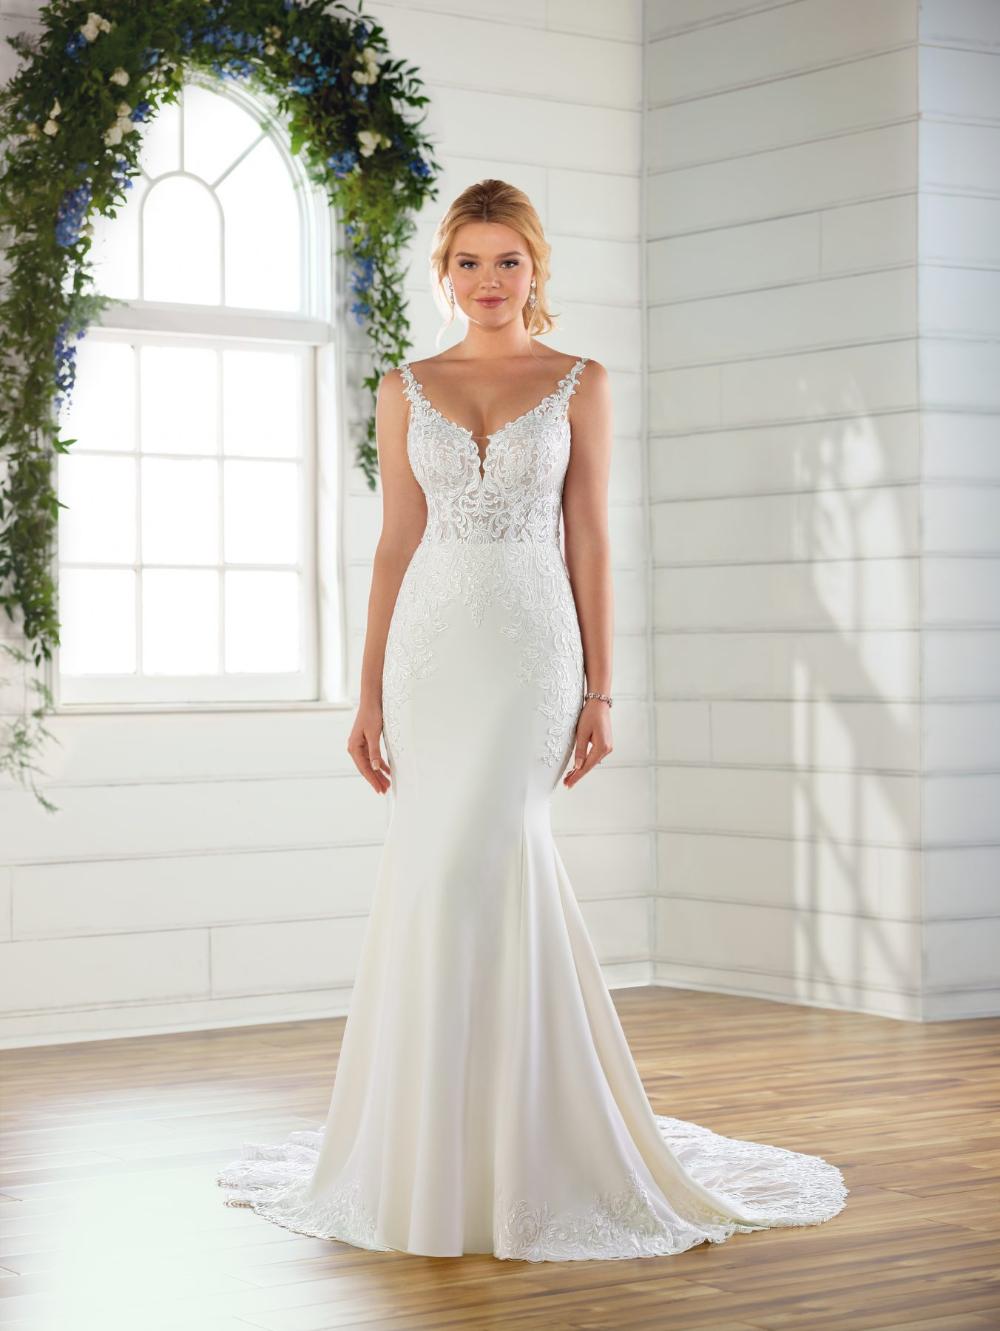 Vneck crepe wedding dress Kleinfeld Bridal in 2020